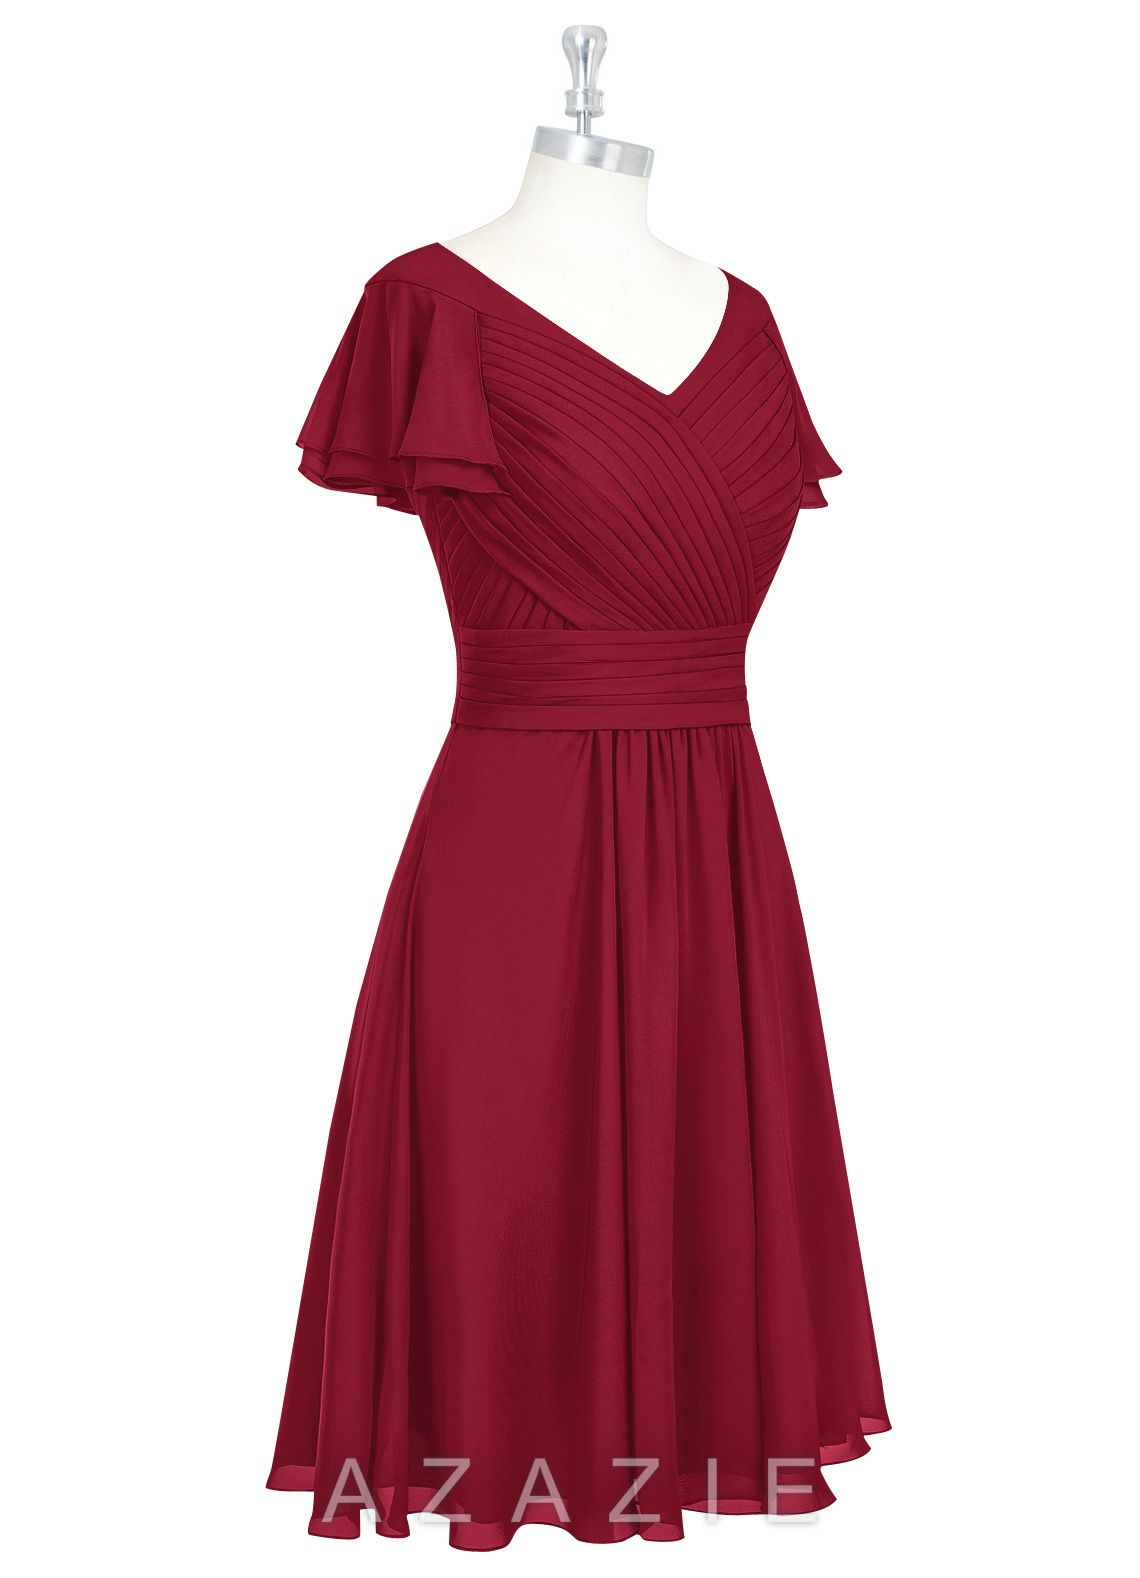 Wedding dresses for bridesmaids  HADLEY  Modest Bridesmaid Dresses  Modest bridesmaid dresses and